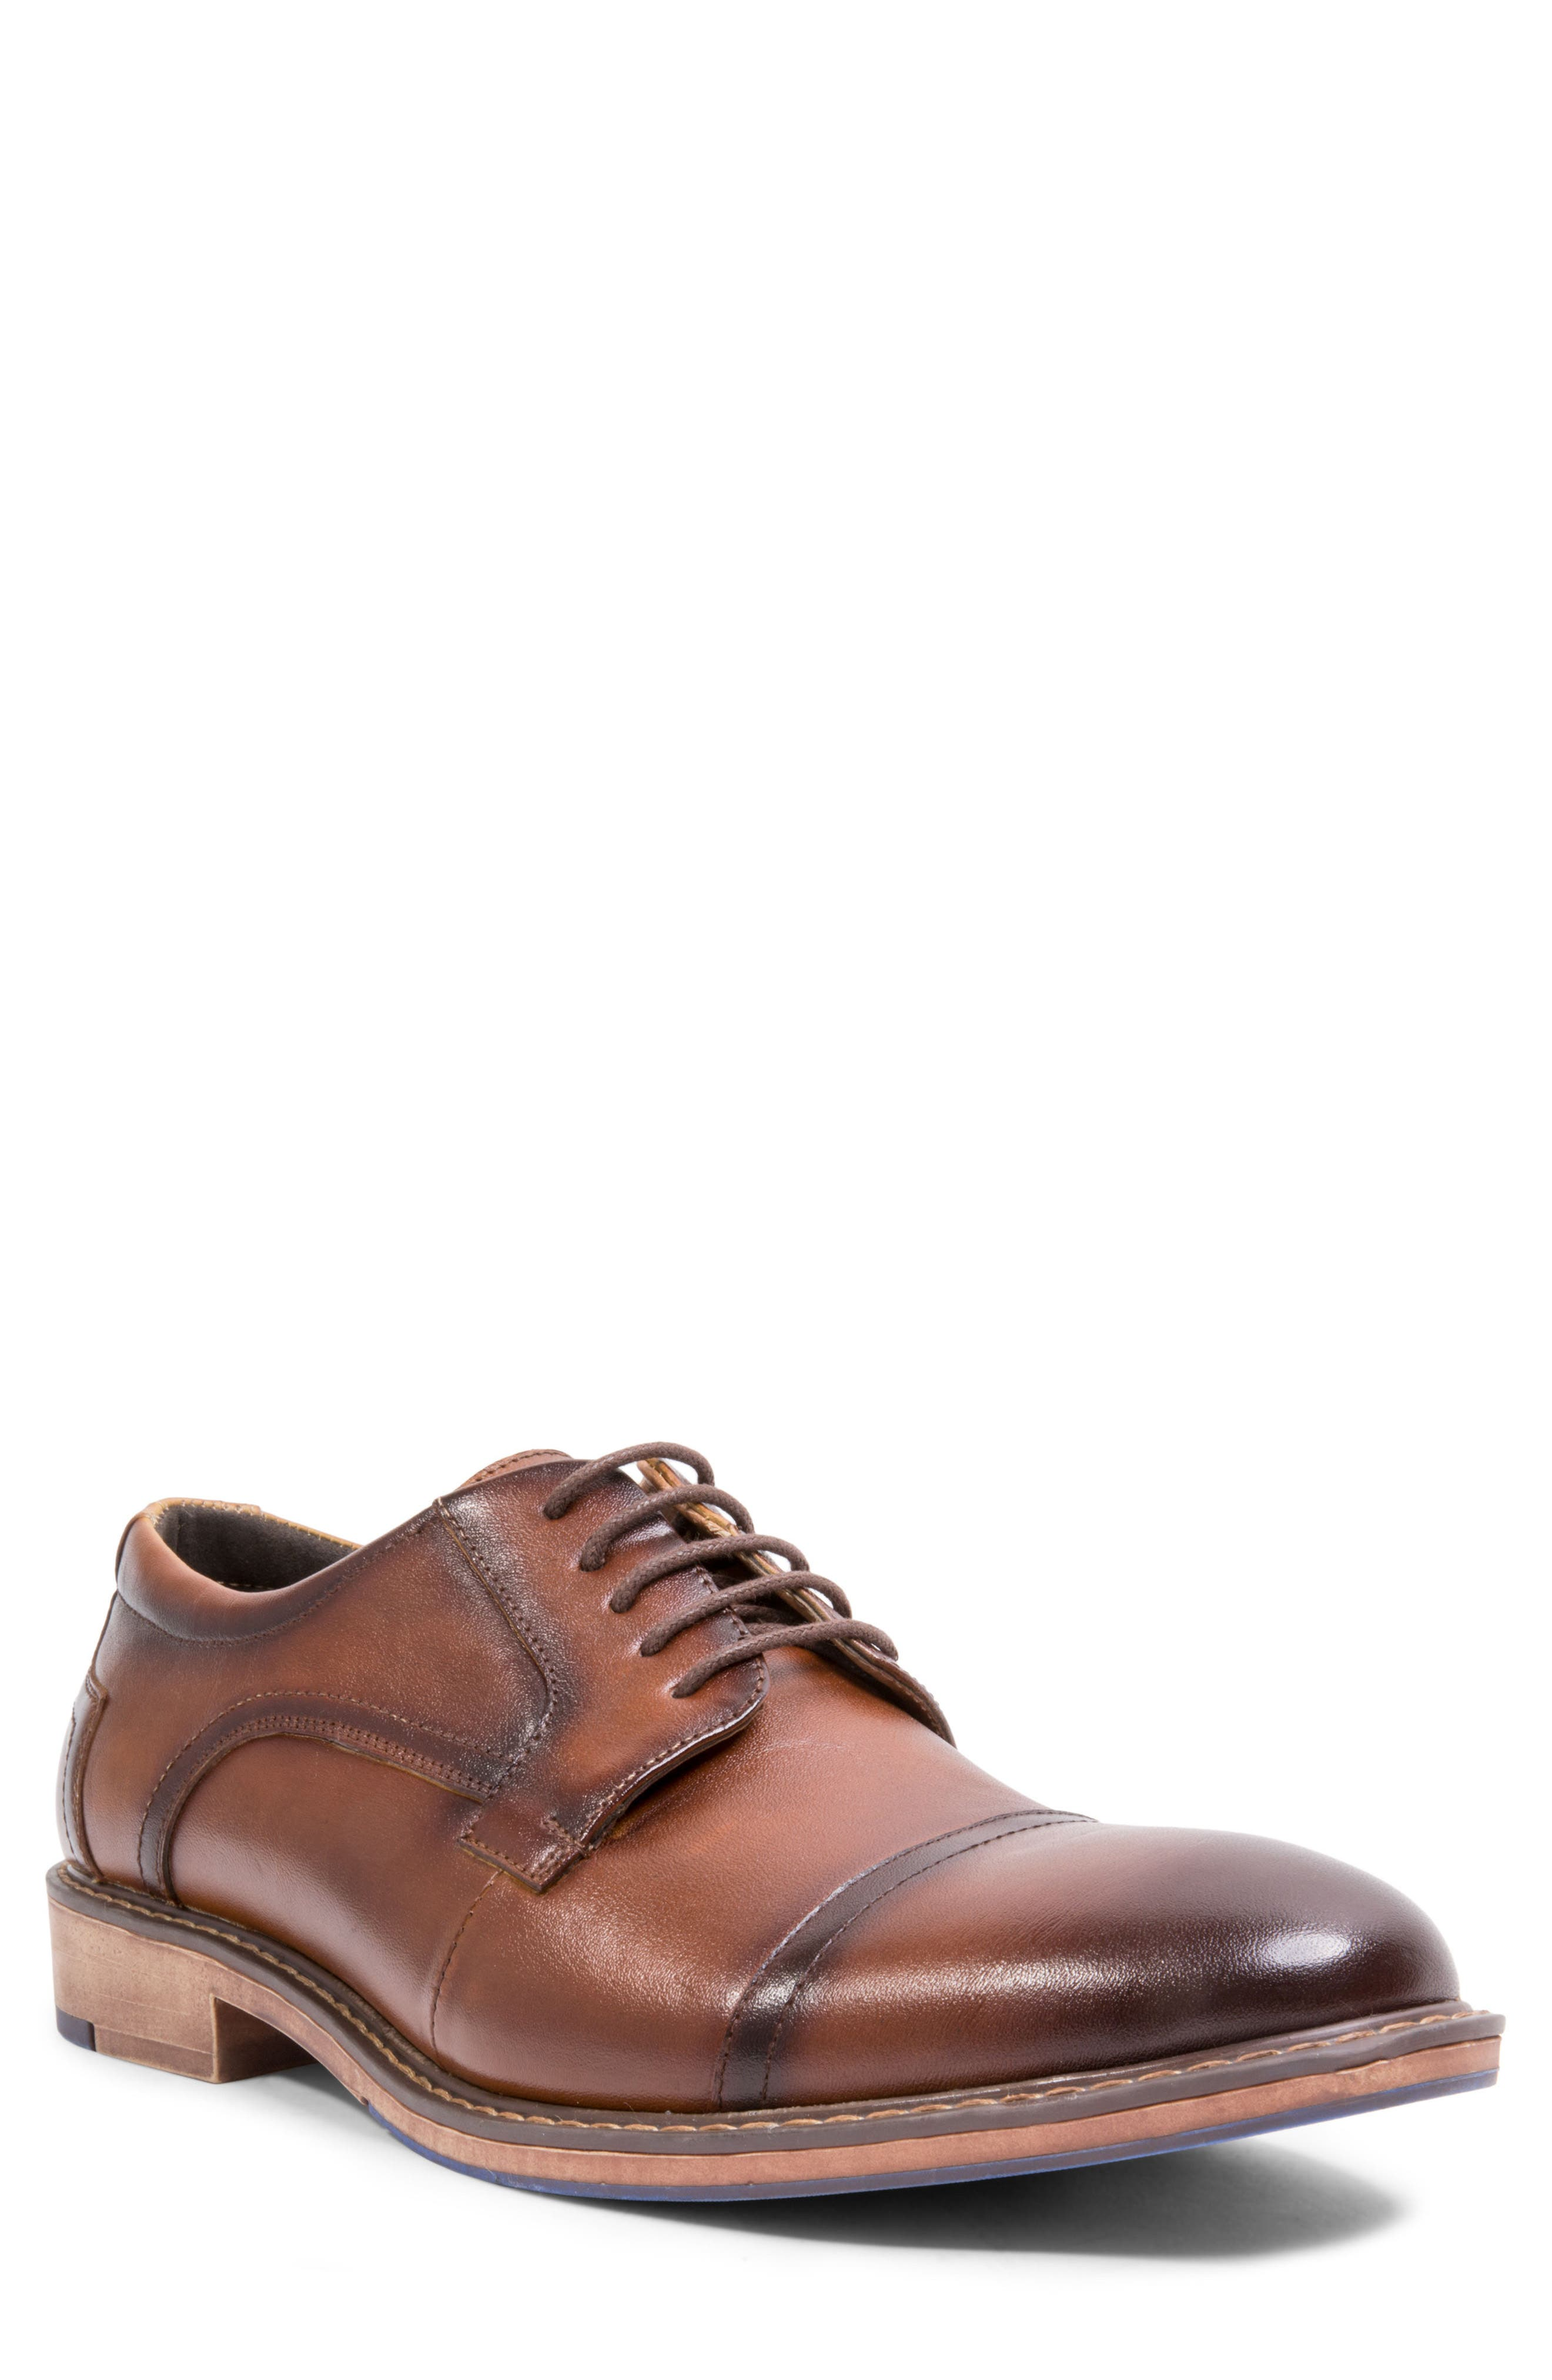 Averie Cap Toe Derby,                         Main,                         color, Tan Leather